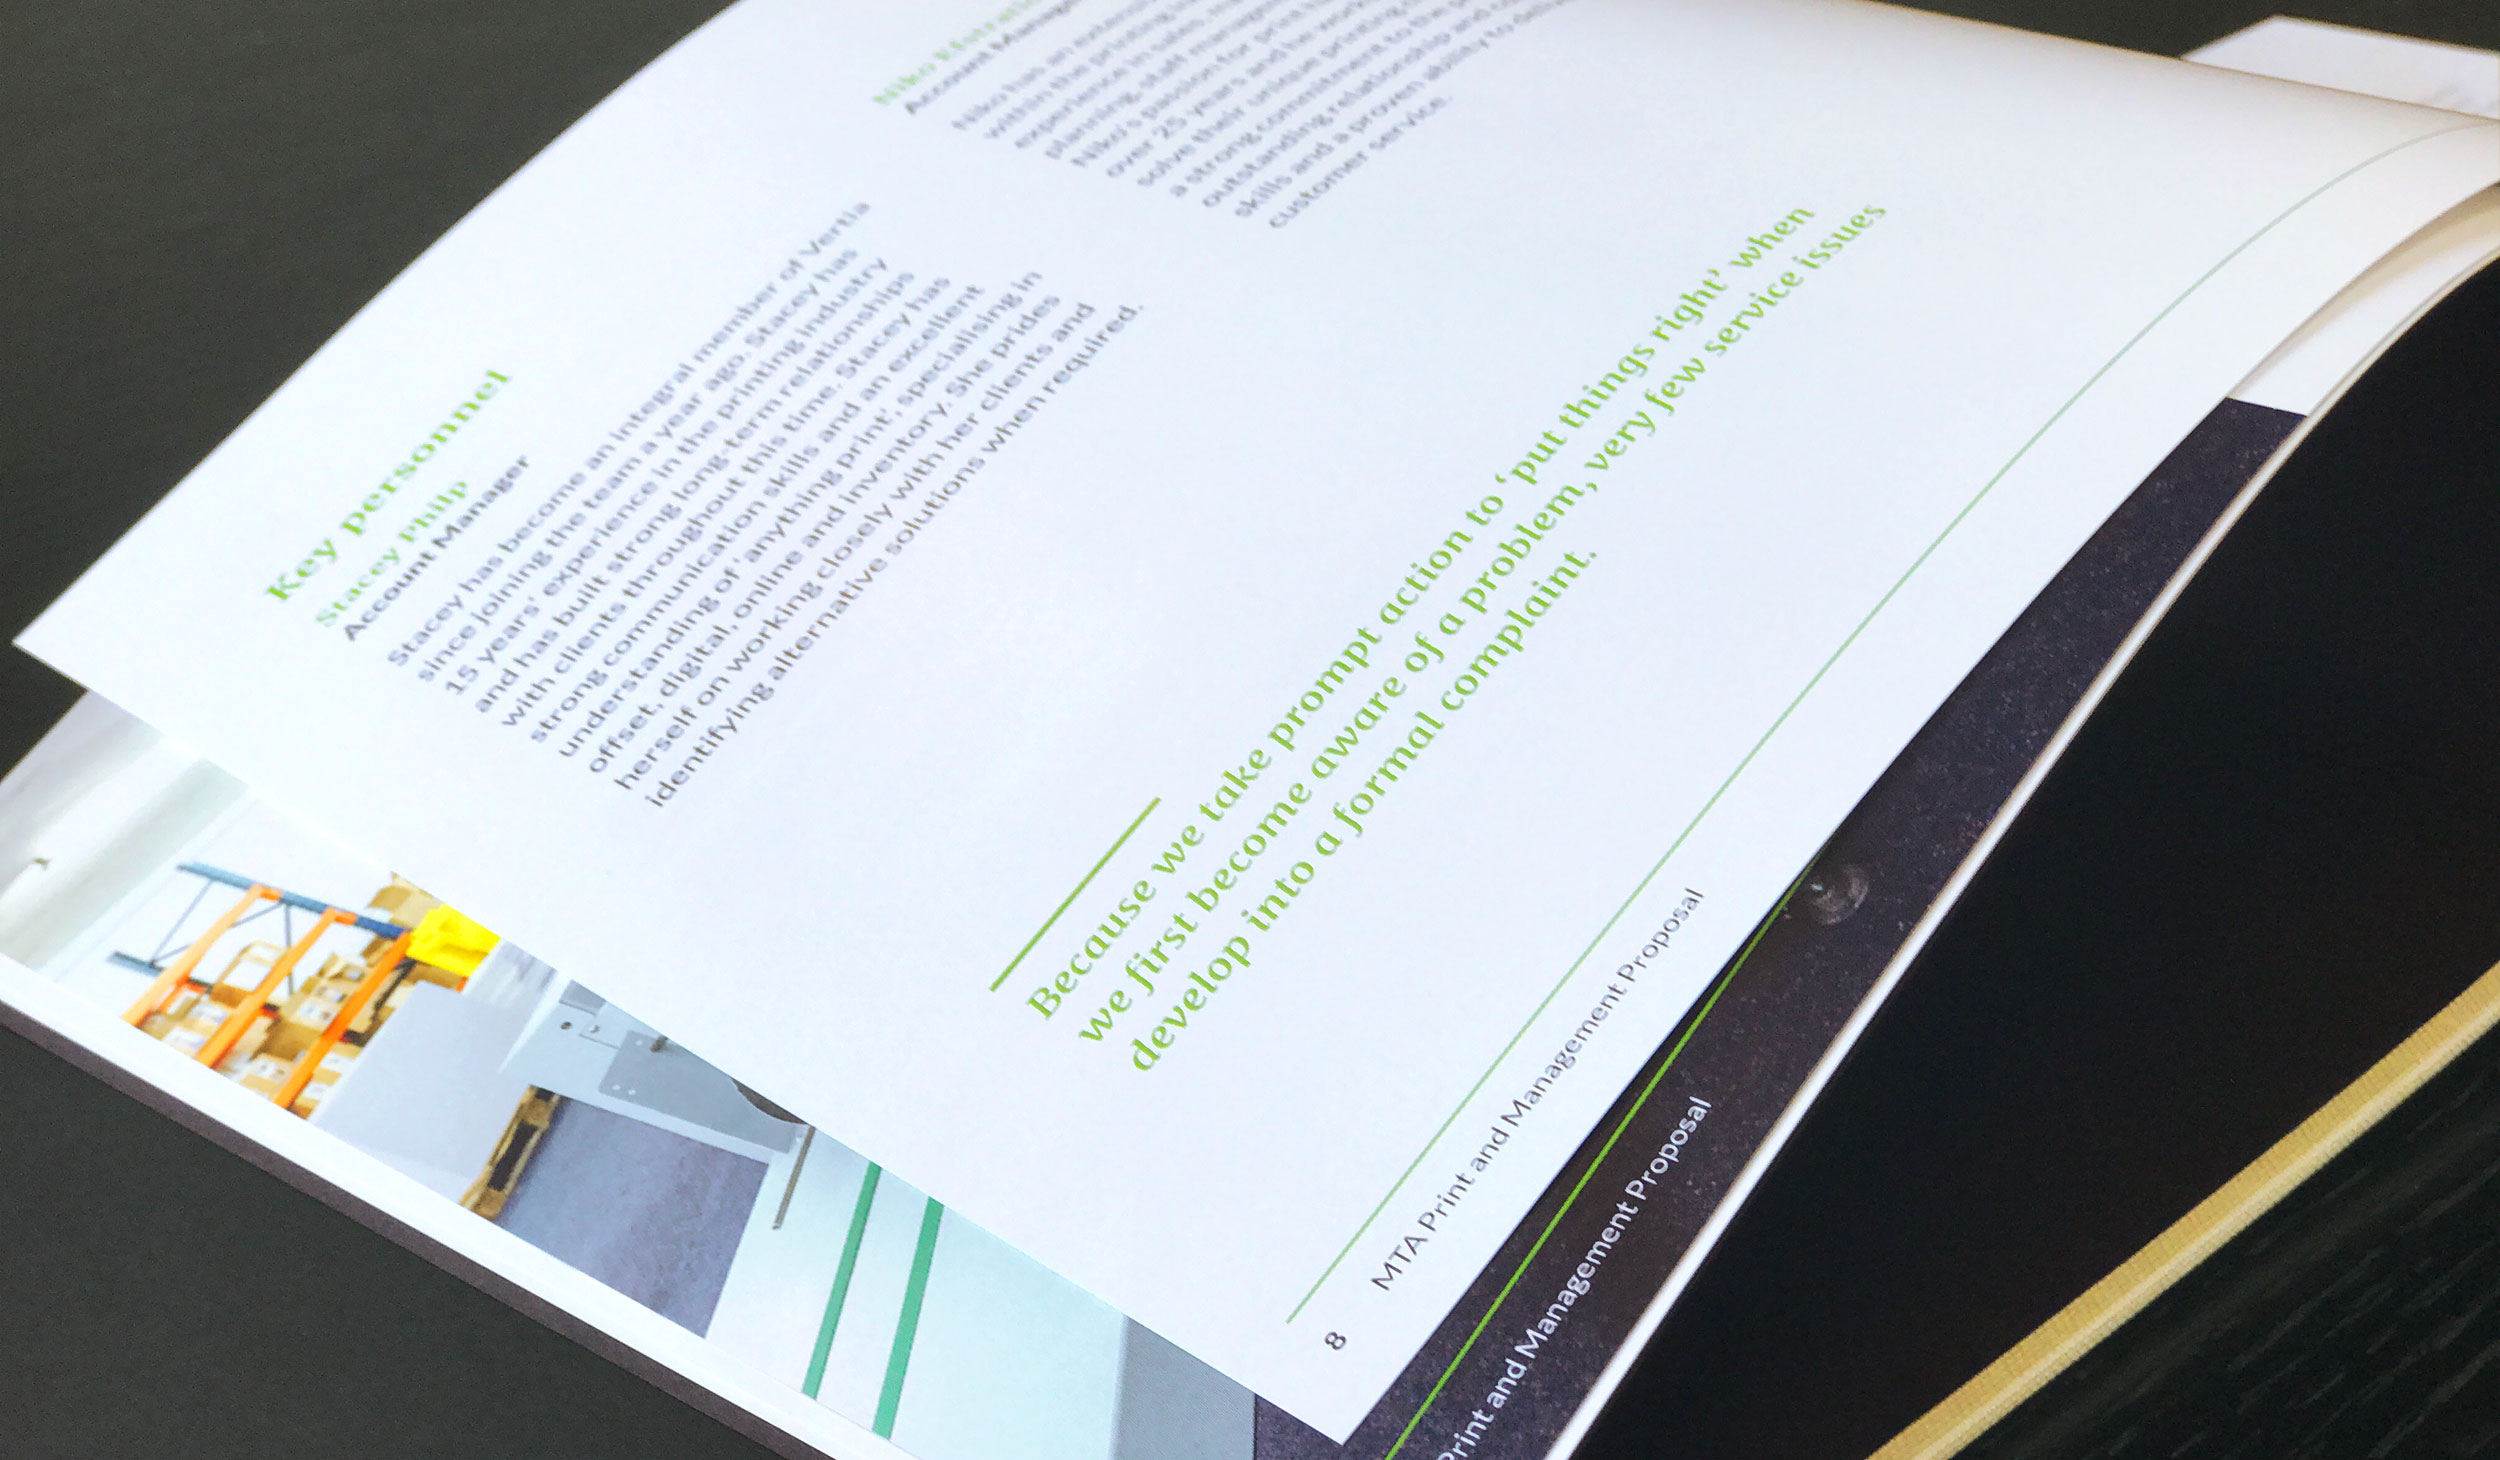 RAFB_Vertia-Book-2.jpg